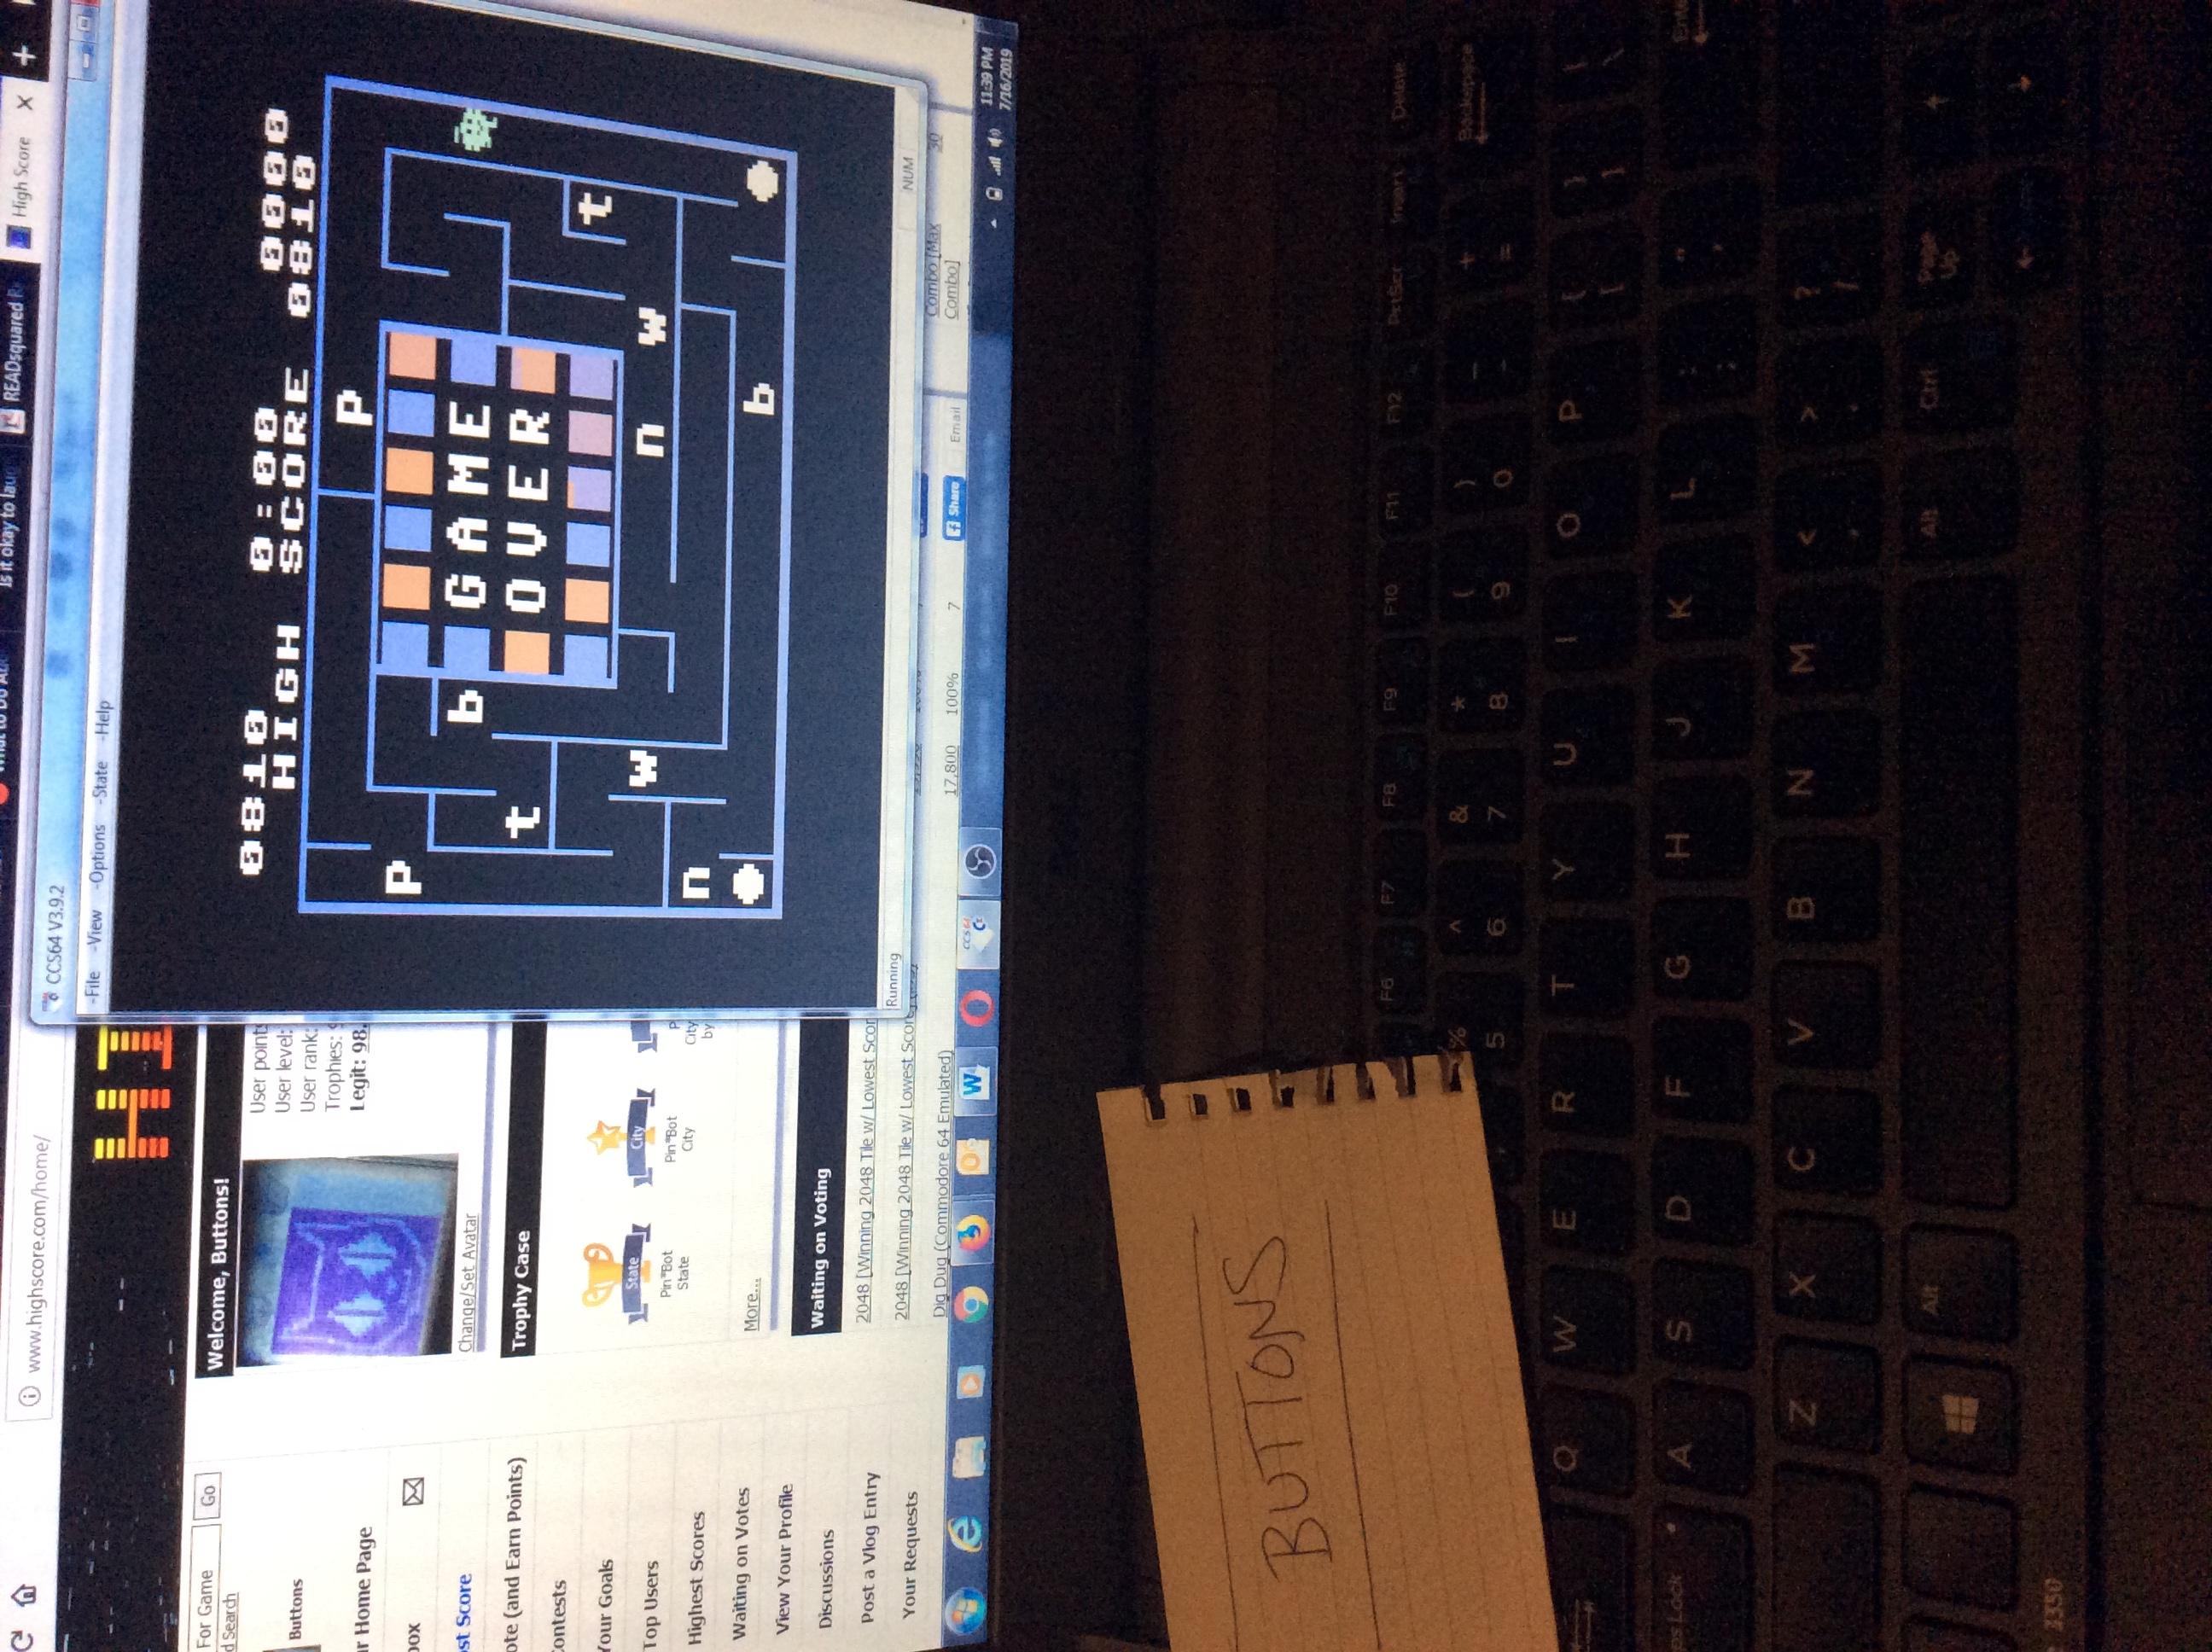 Alphabet Zoo [Level 2 / Game 1 / Lowercase] 810 points